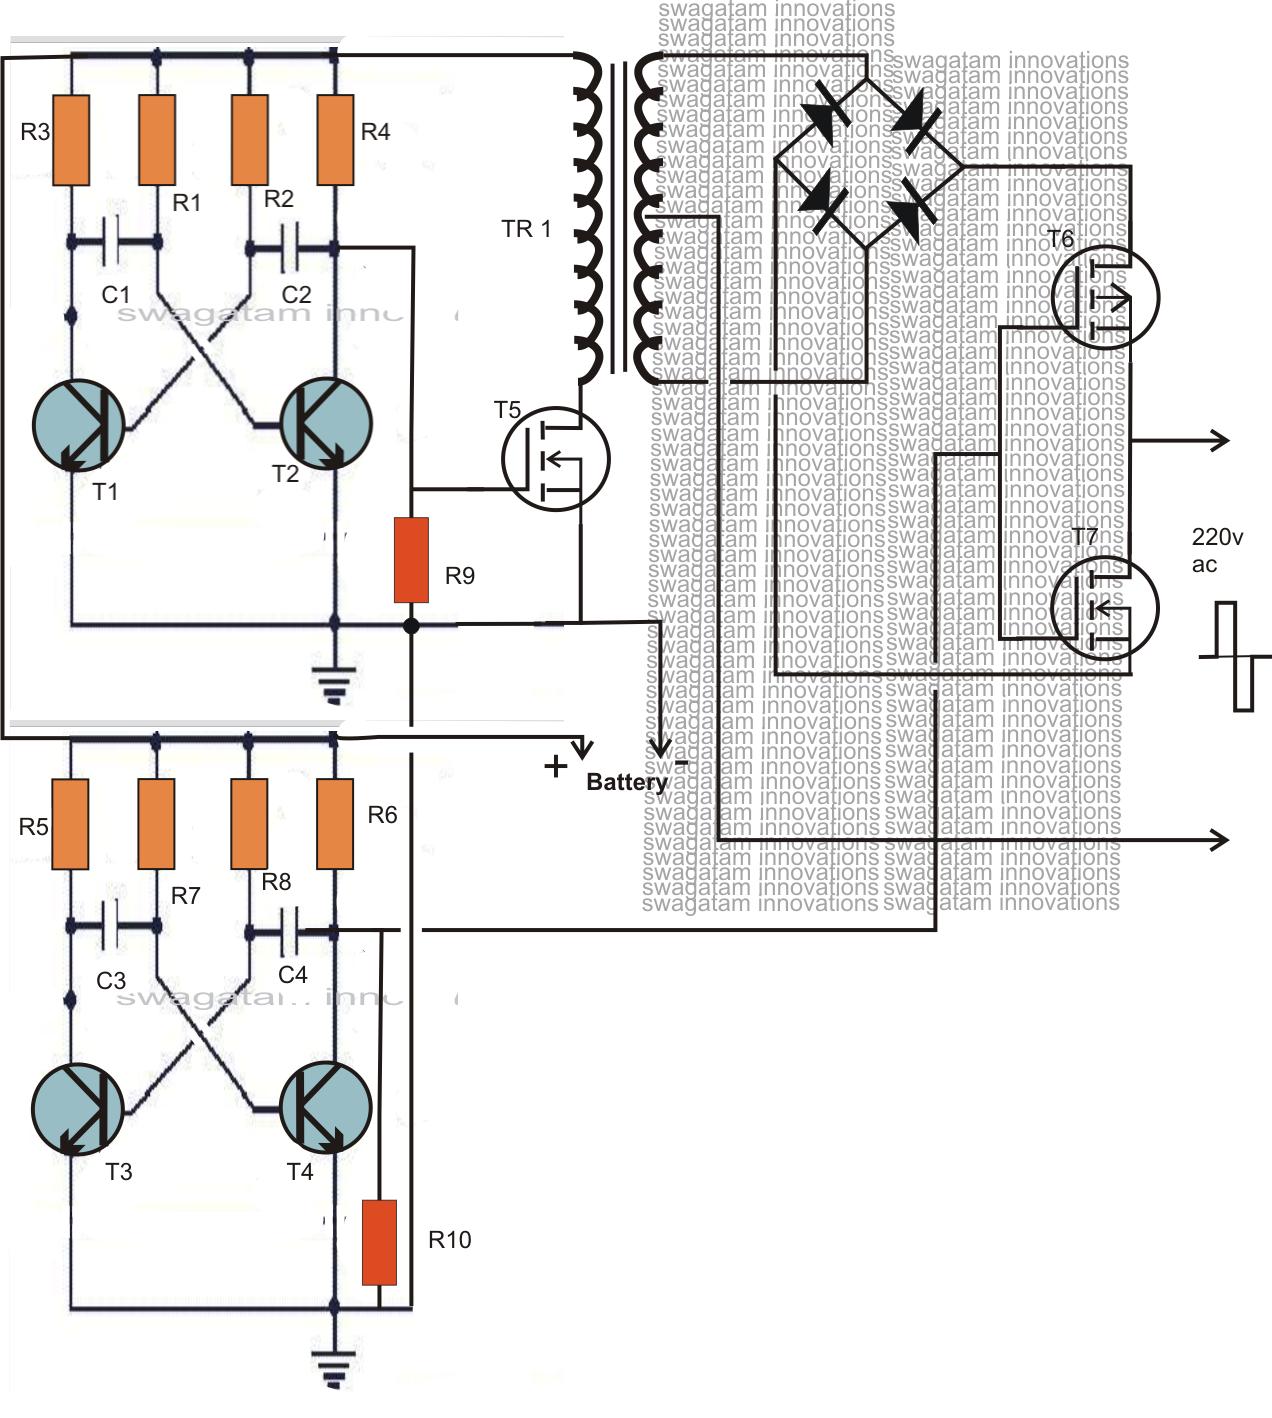 240v To 12v Transformer Wiring Diagram Utility Trailer 4 X 8 Dc 220v Ac Inverter Circuit How Make Pdf